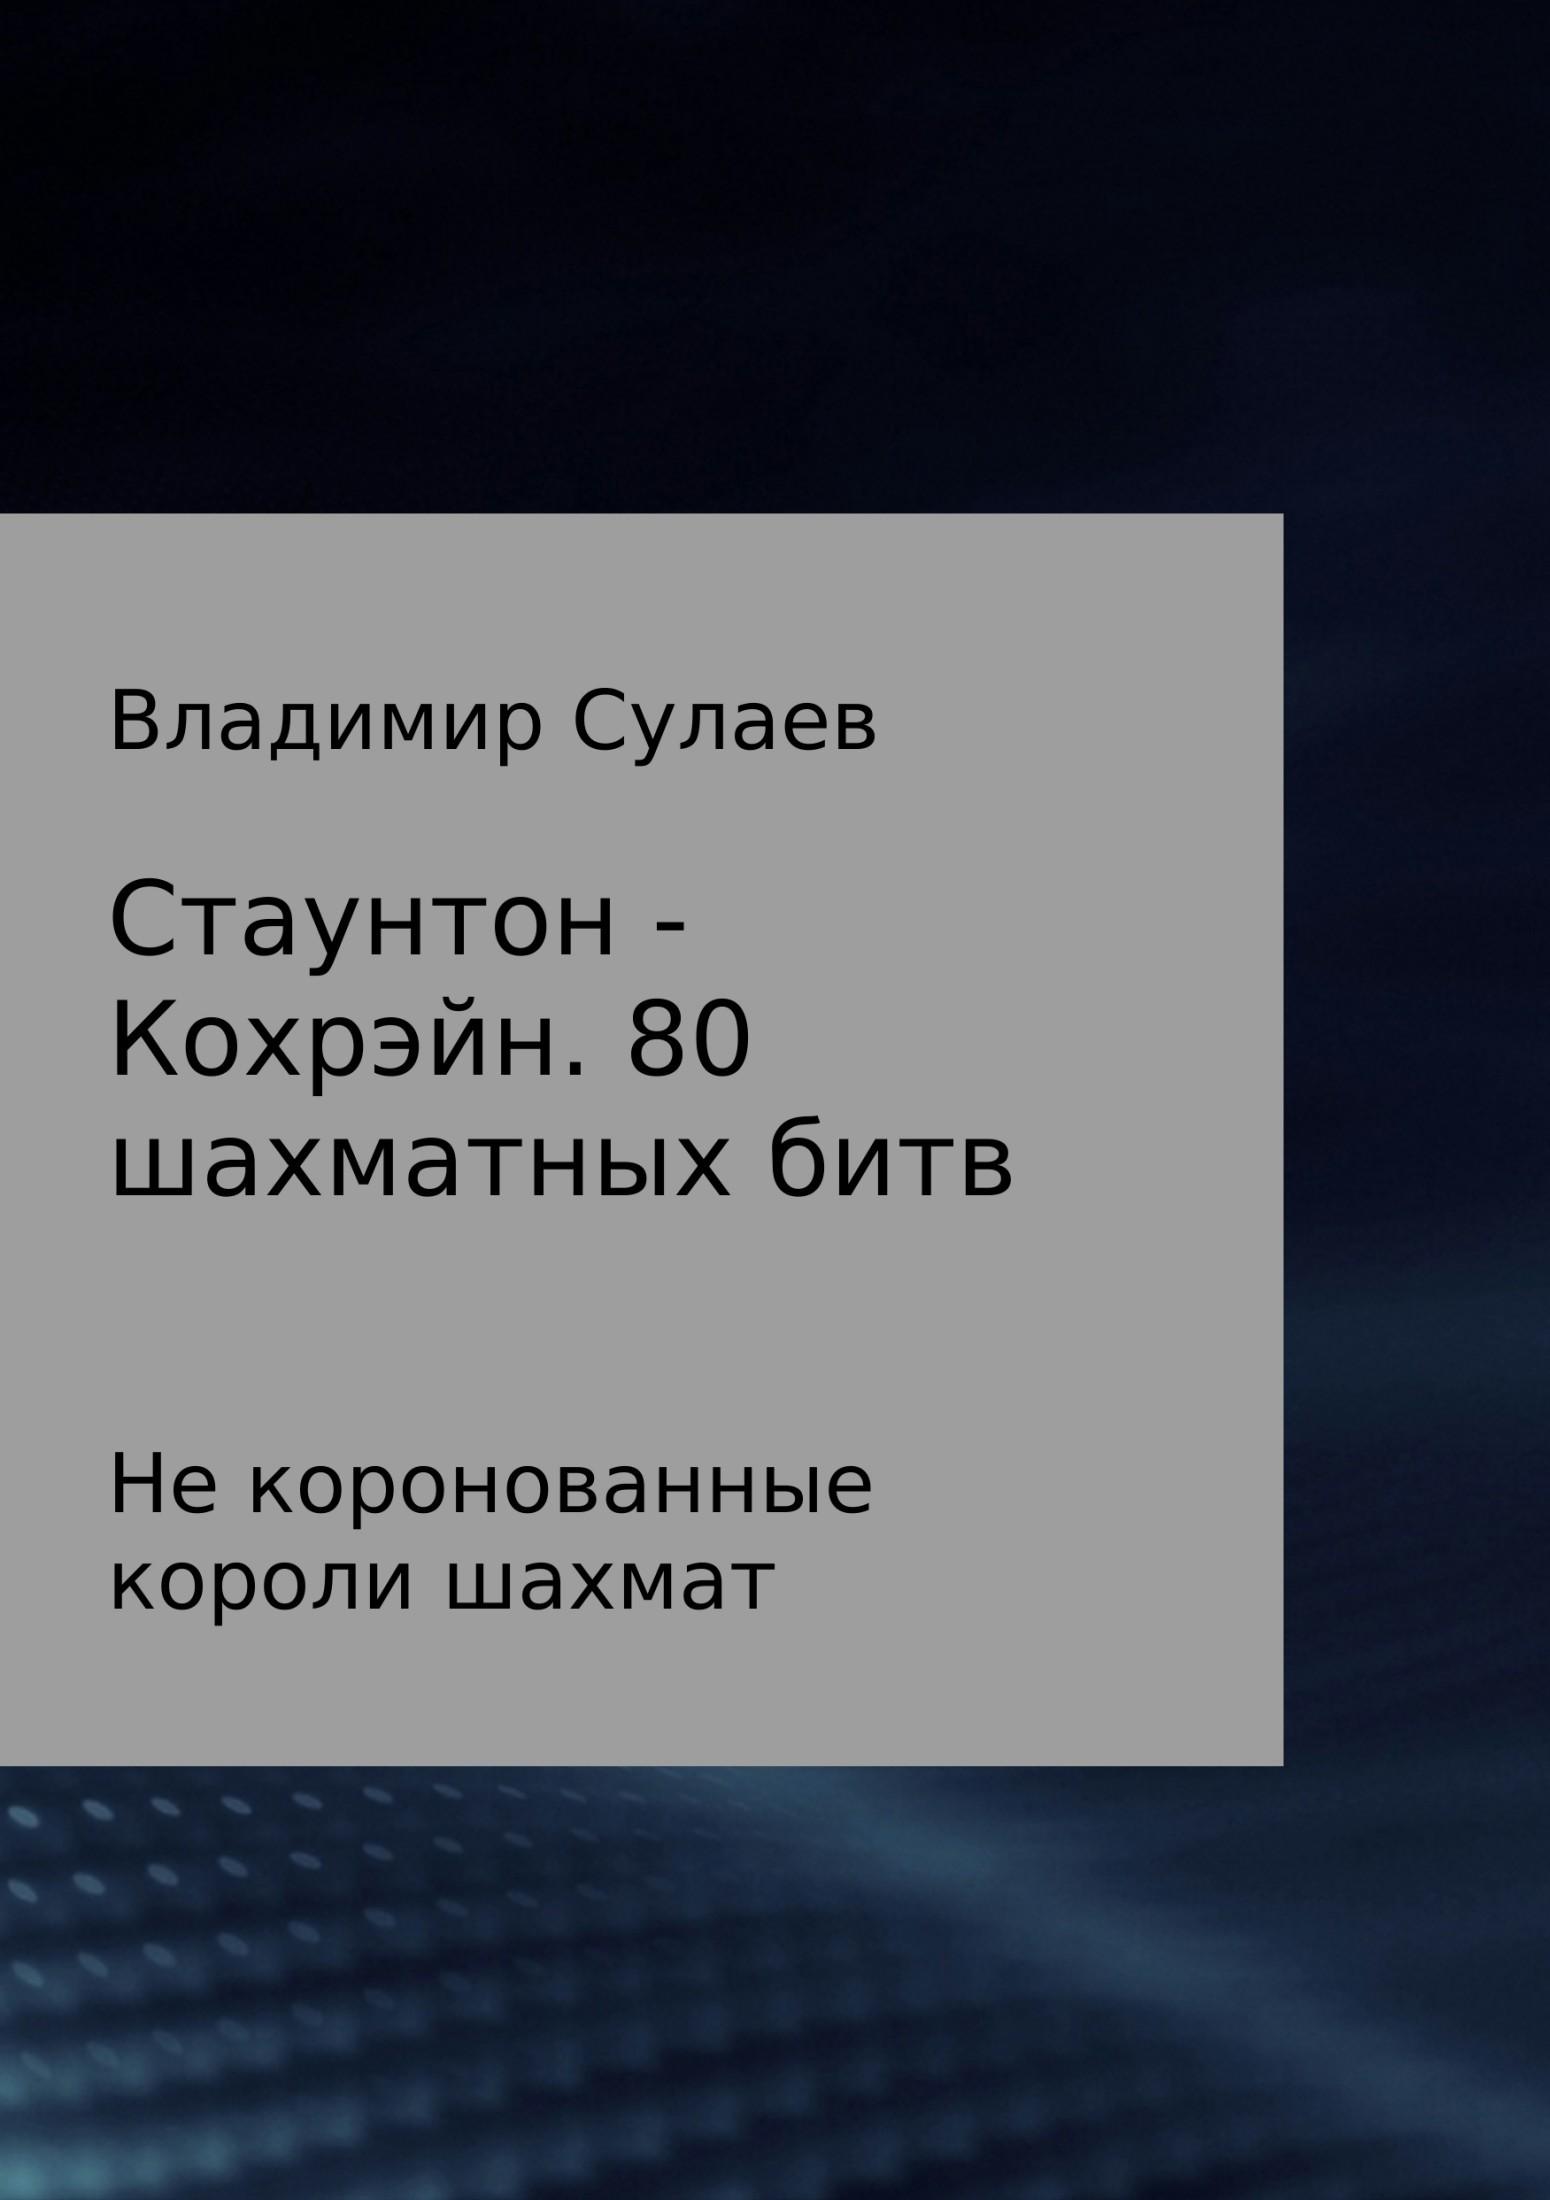 Владимир Валерьевич Сулаев Стаунтон – Кохрэйн. 80 партий владимир валерьевич сулаев диалог с